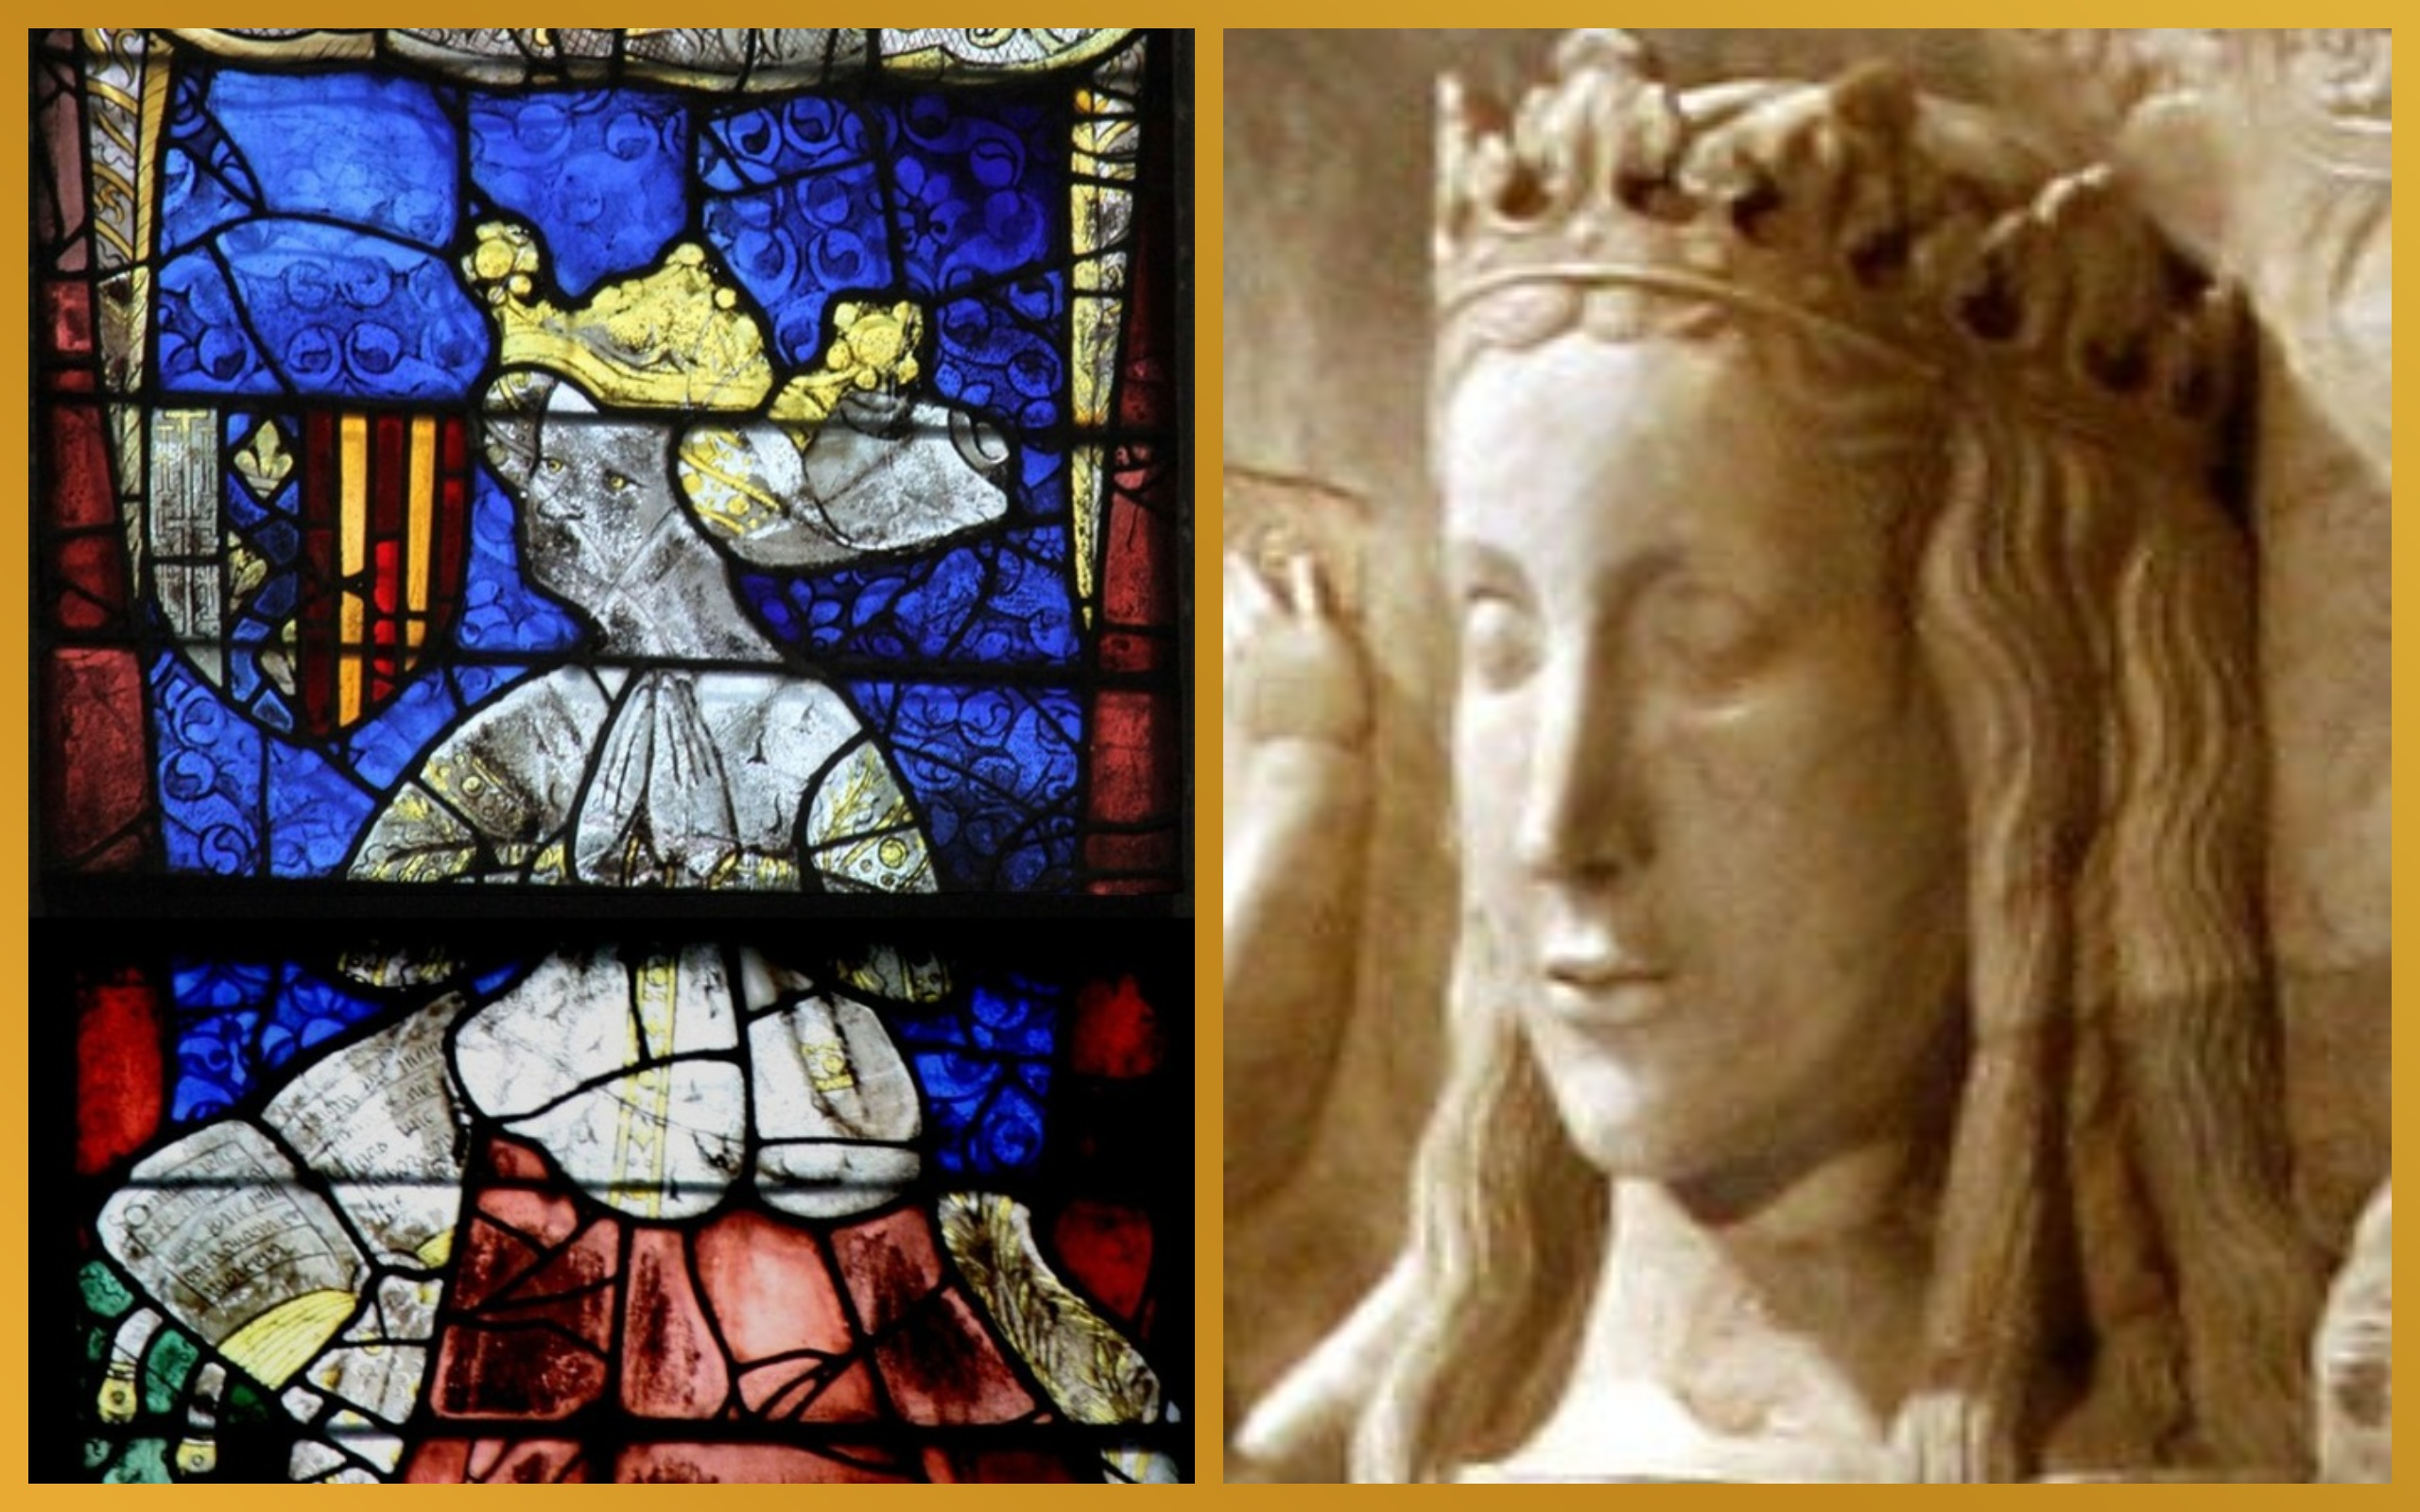 Yolande of Aragon: her mother, Violant de Bar, as a role model